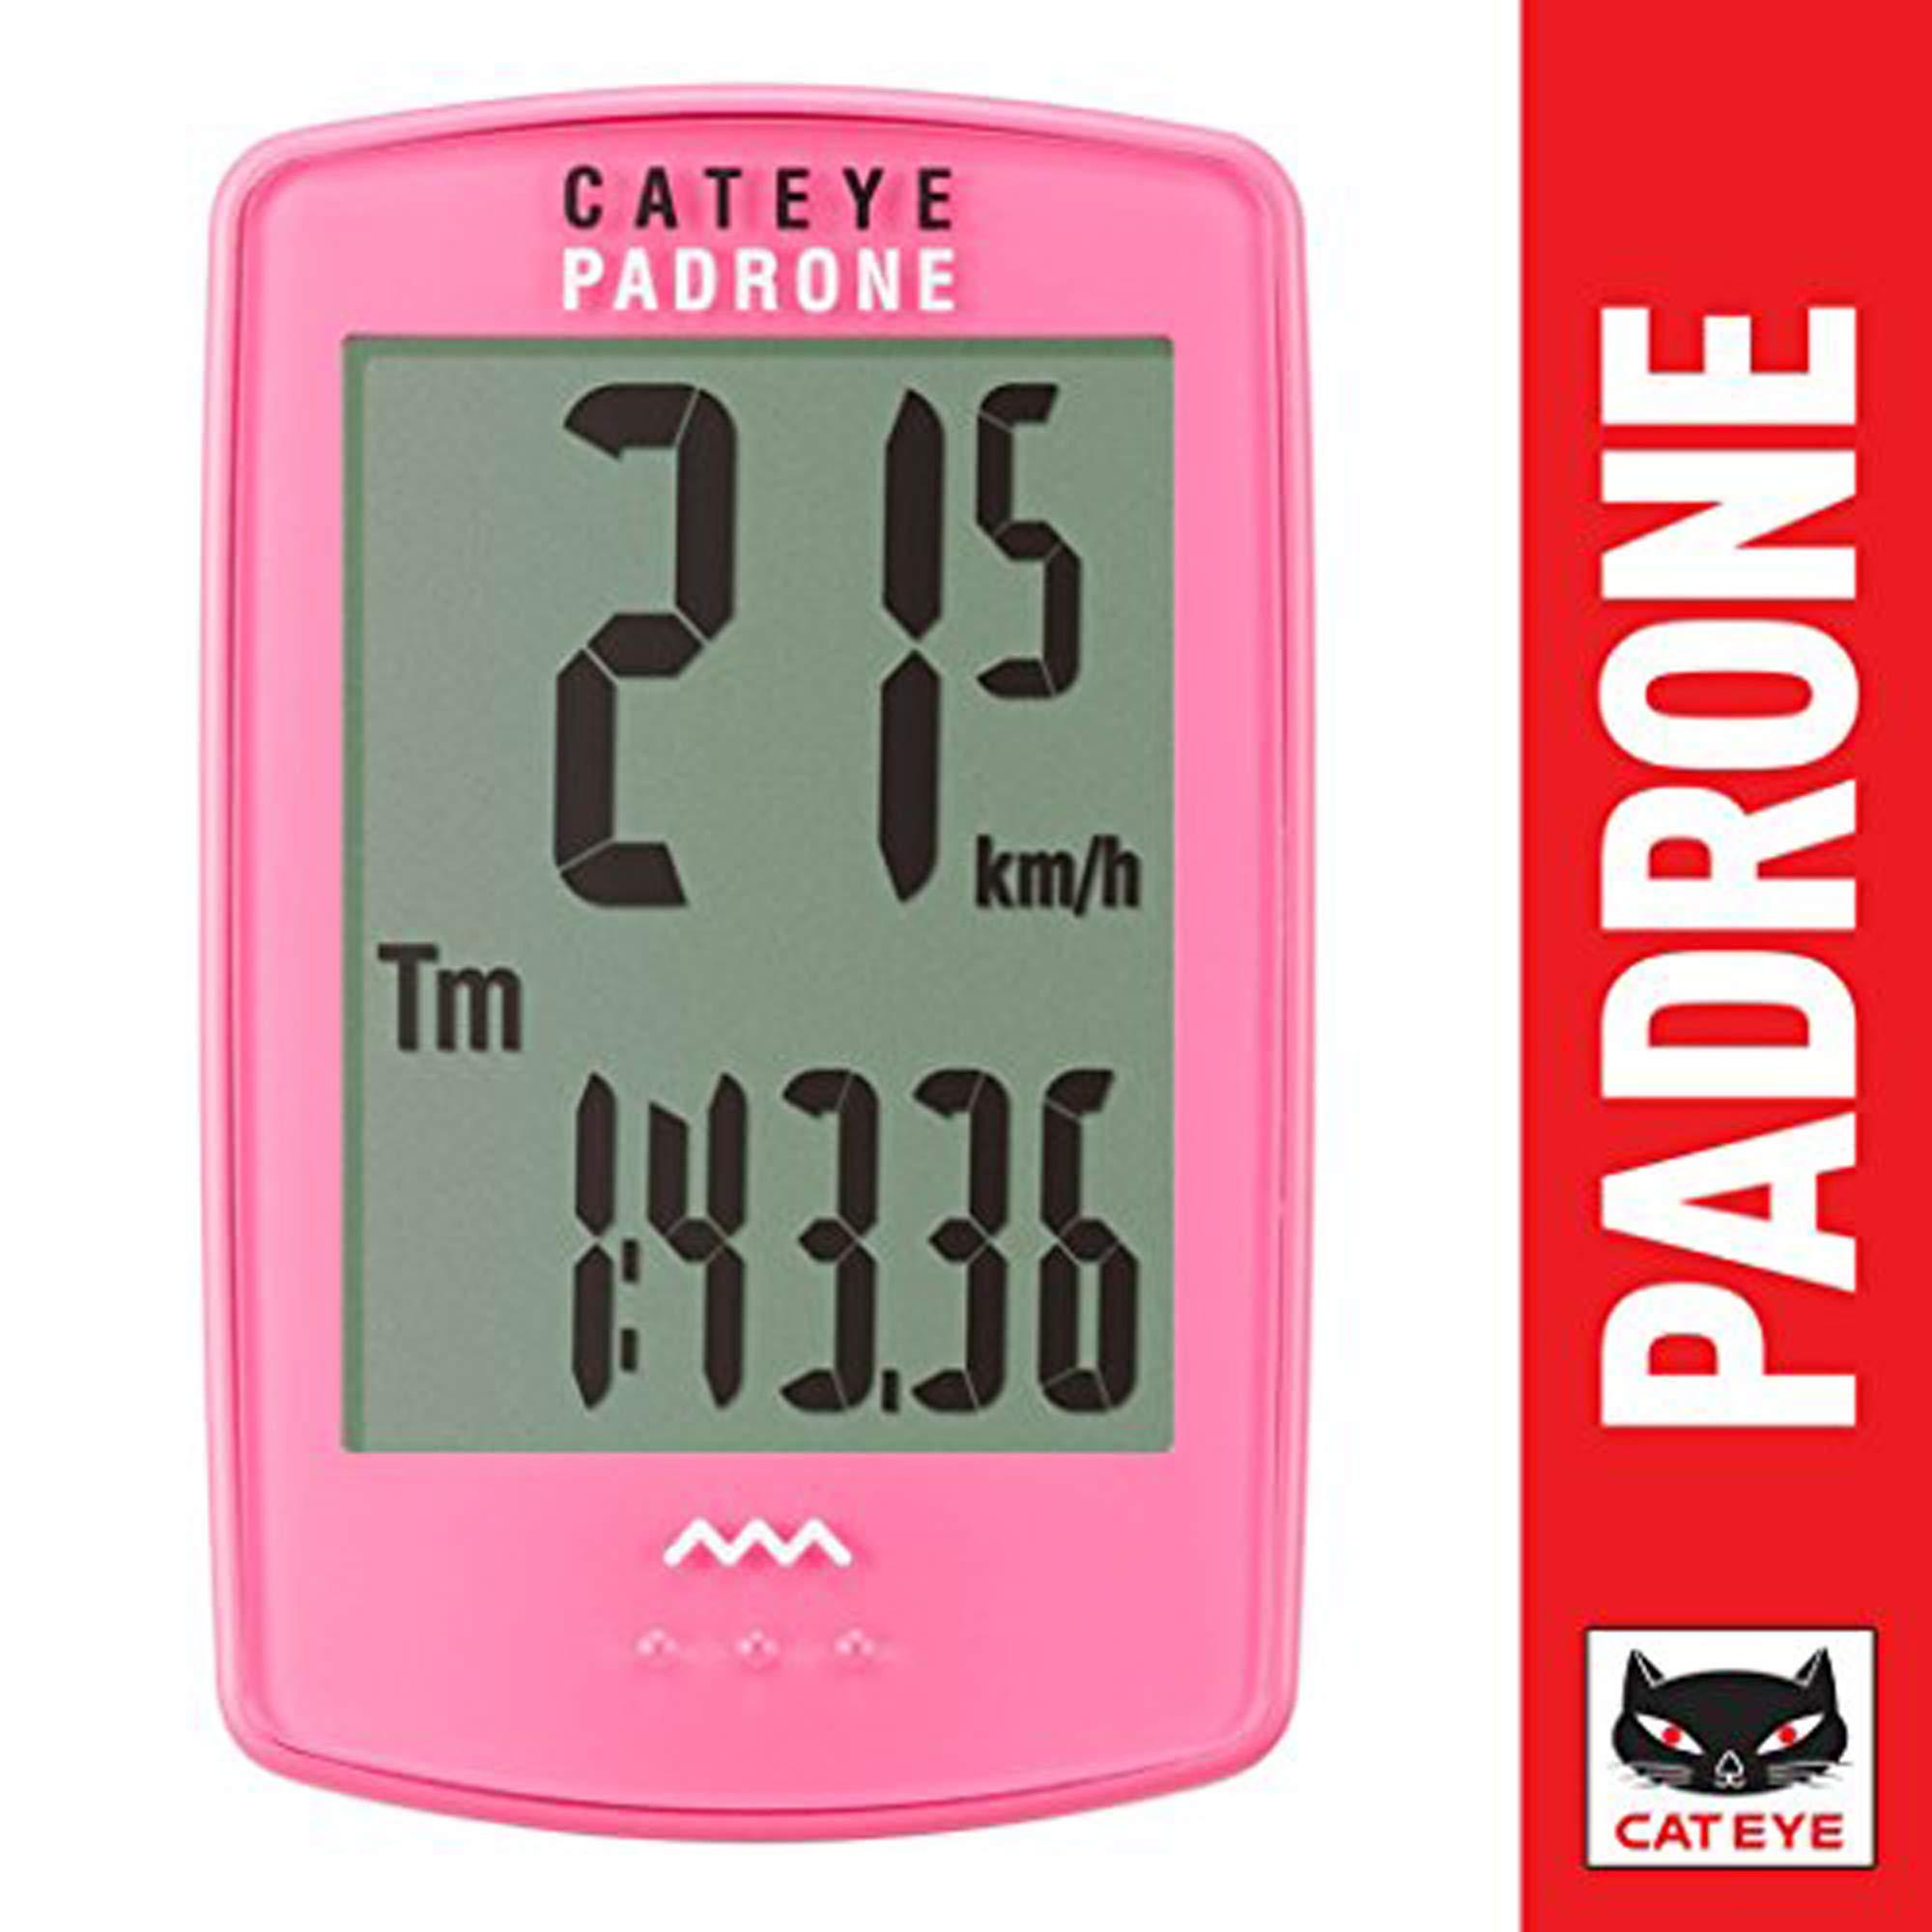 CAT EYE - Padrone Wireless Bike Computer, Pink